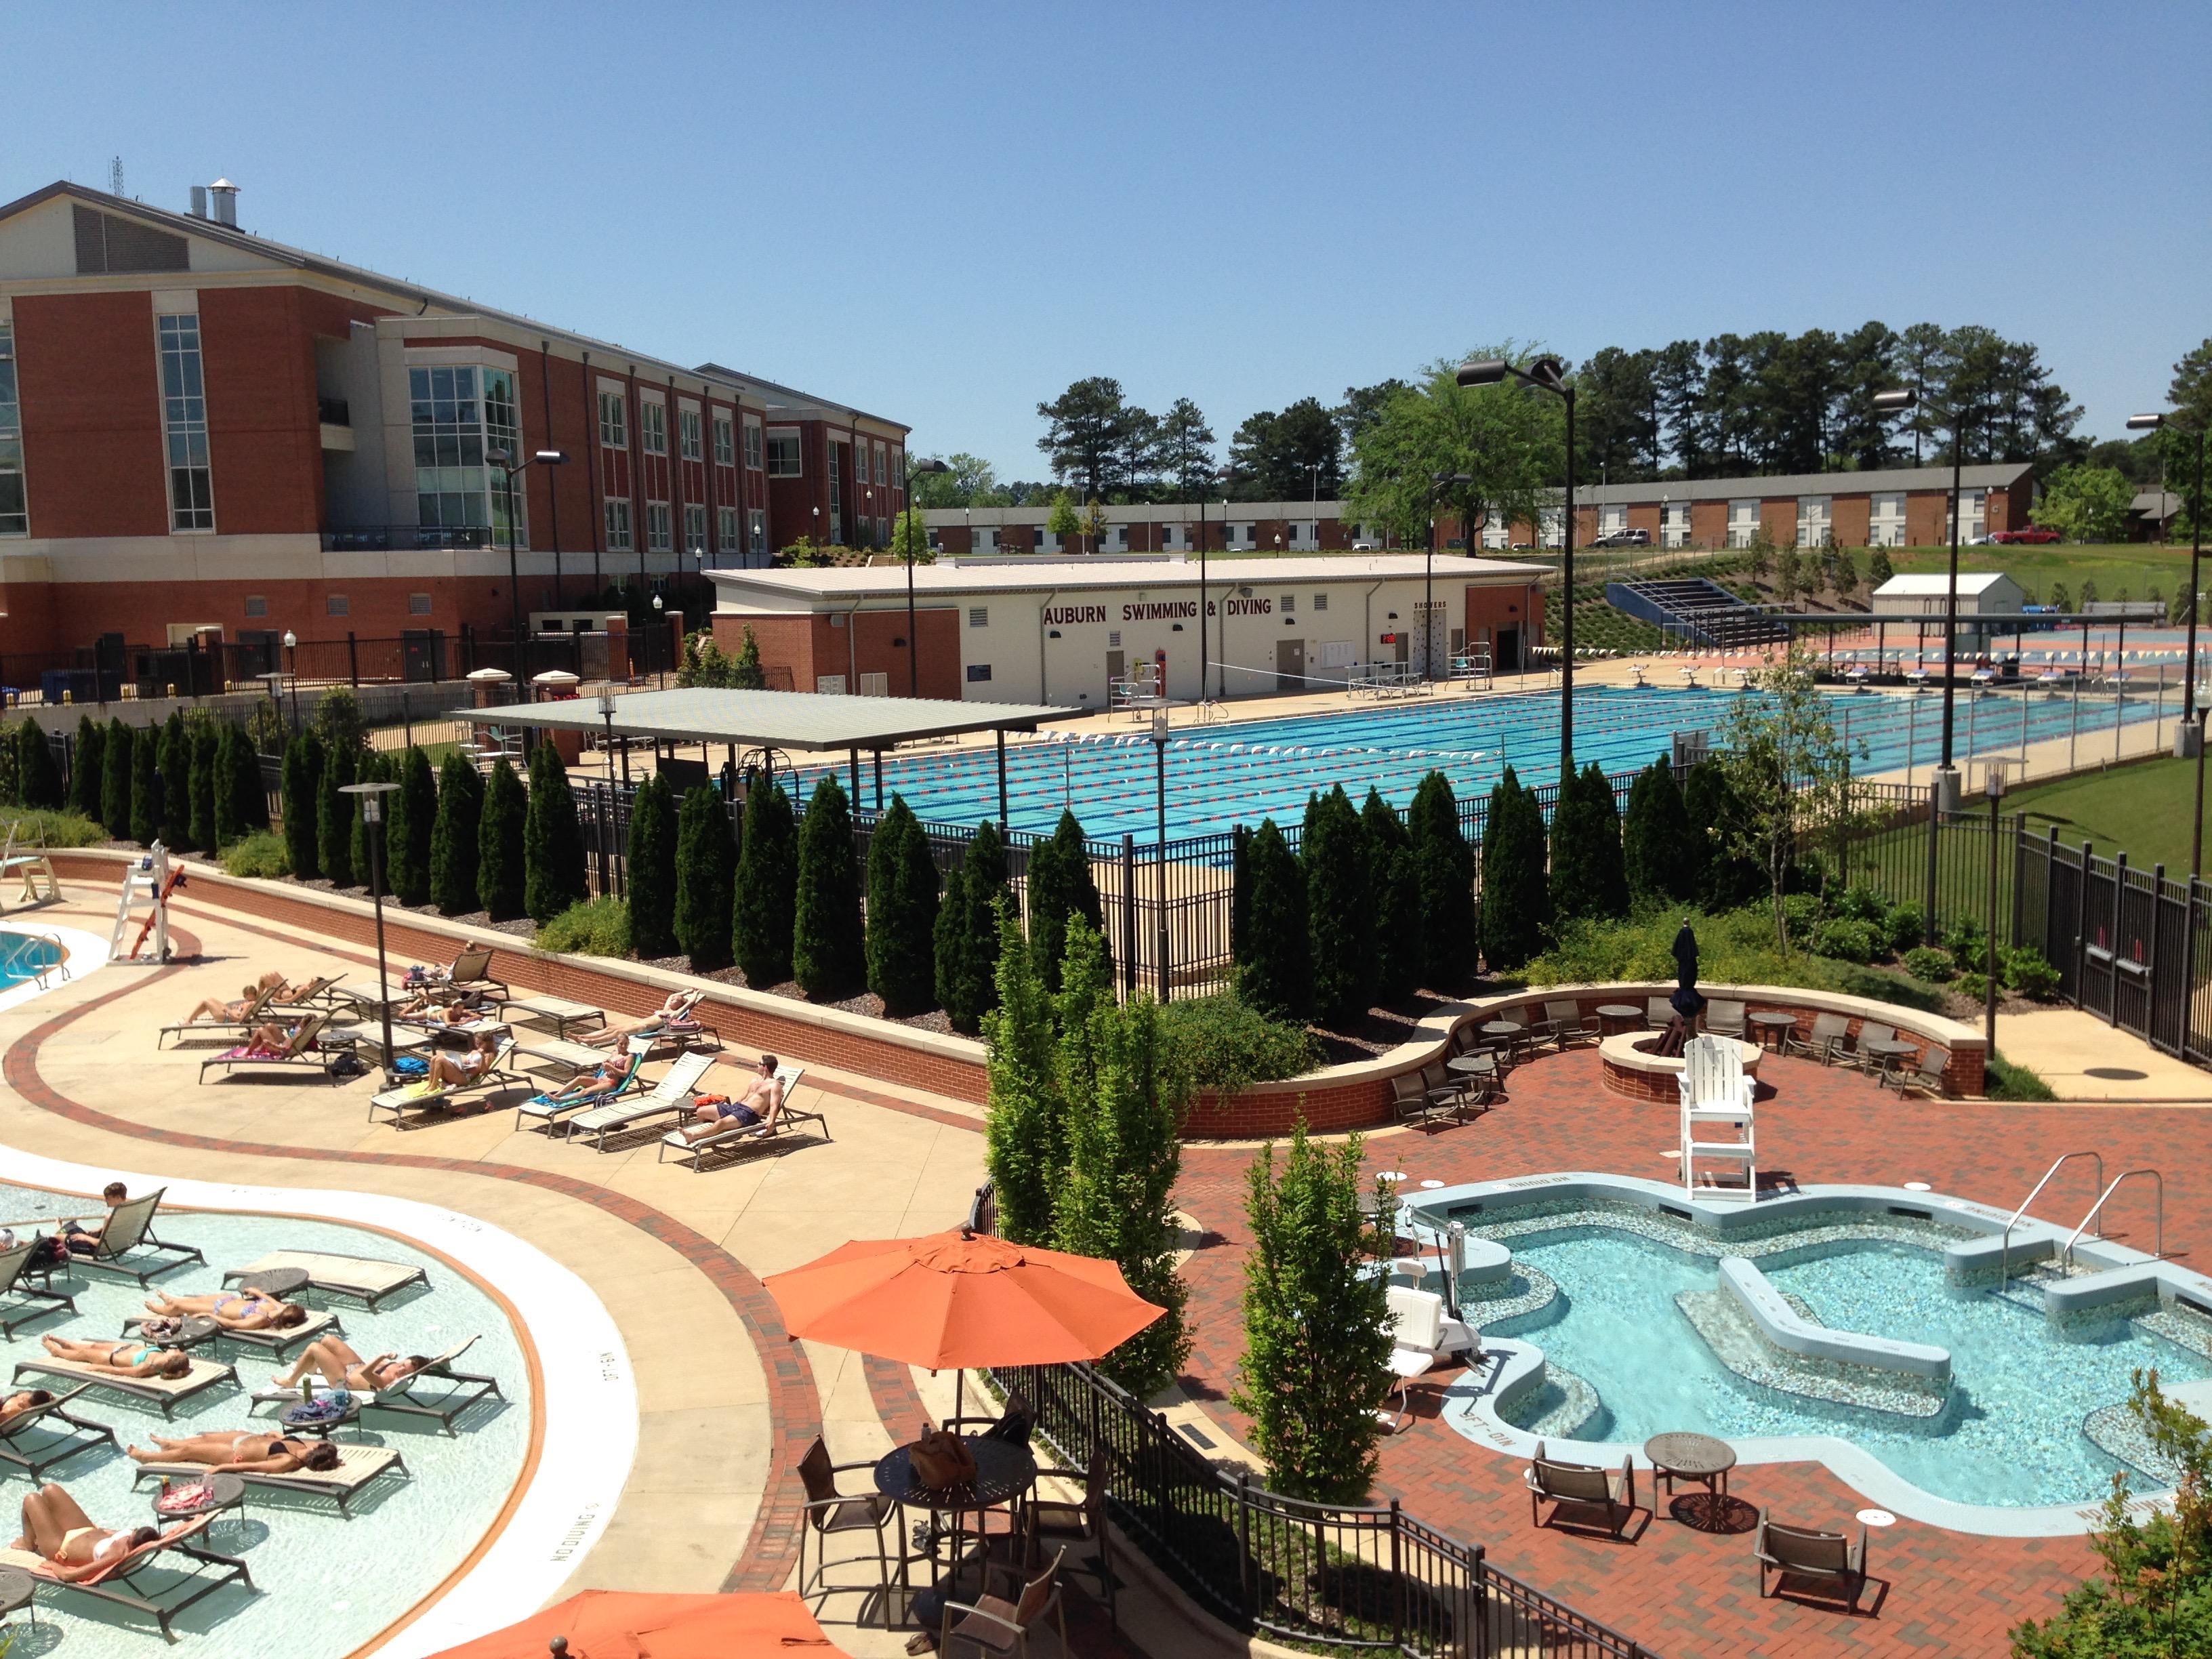 Auburn University 8